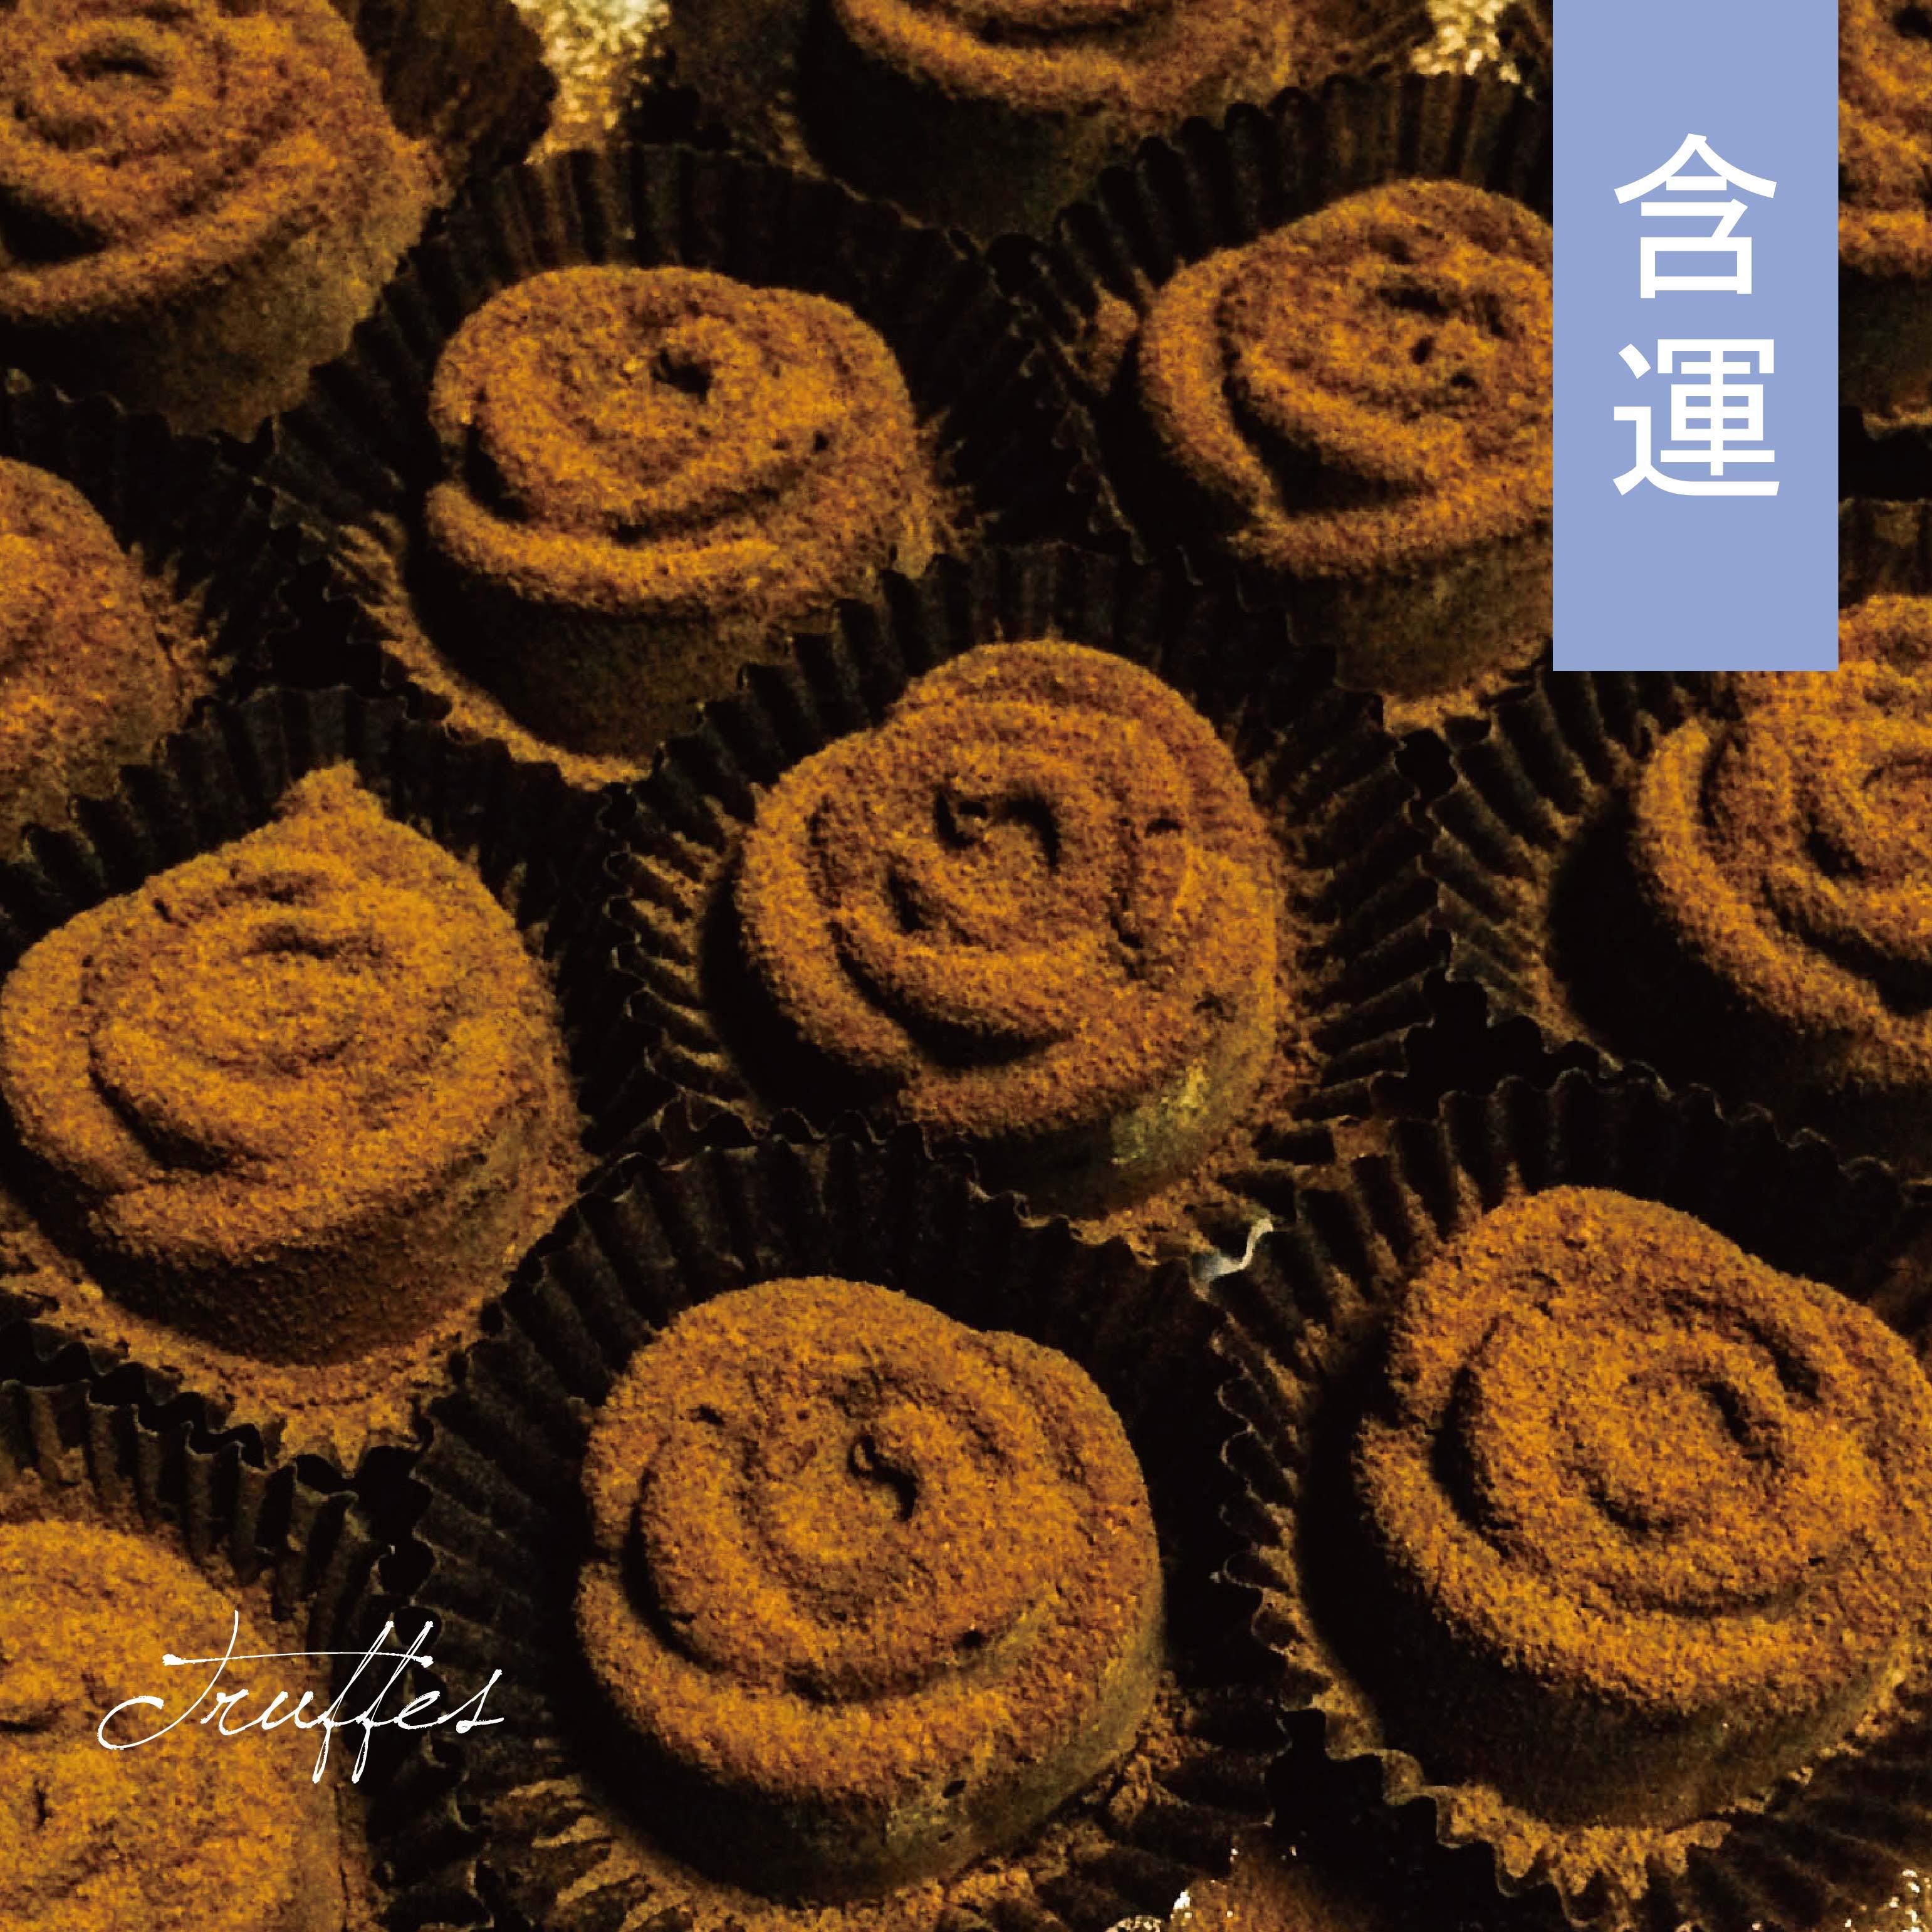 Truffes - 玫瑰松露巧克力 - 9入- 酒釀櫻桃